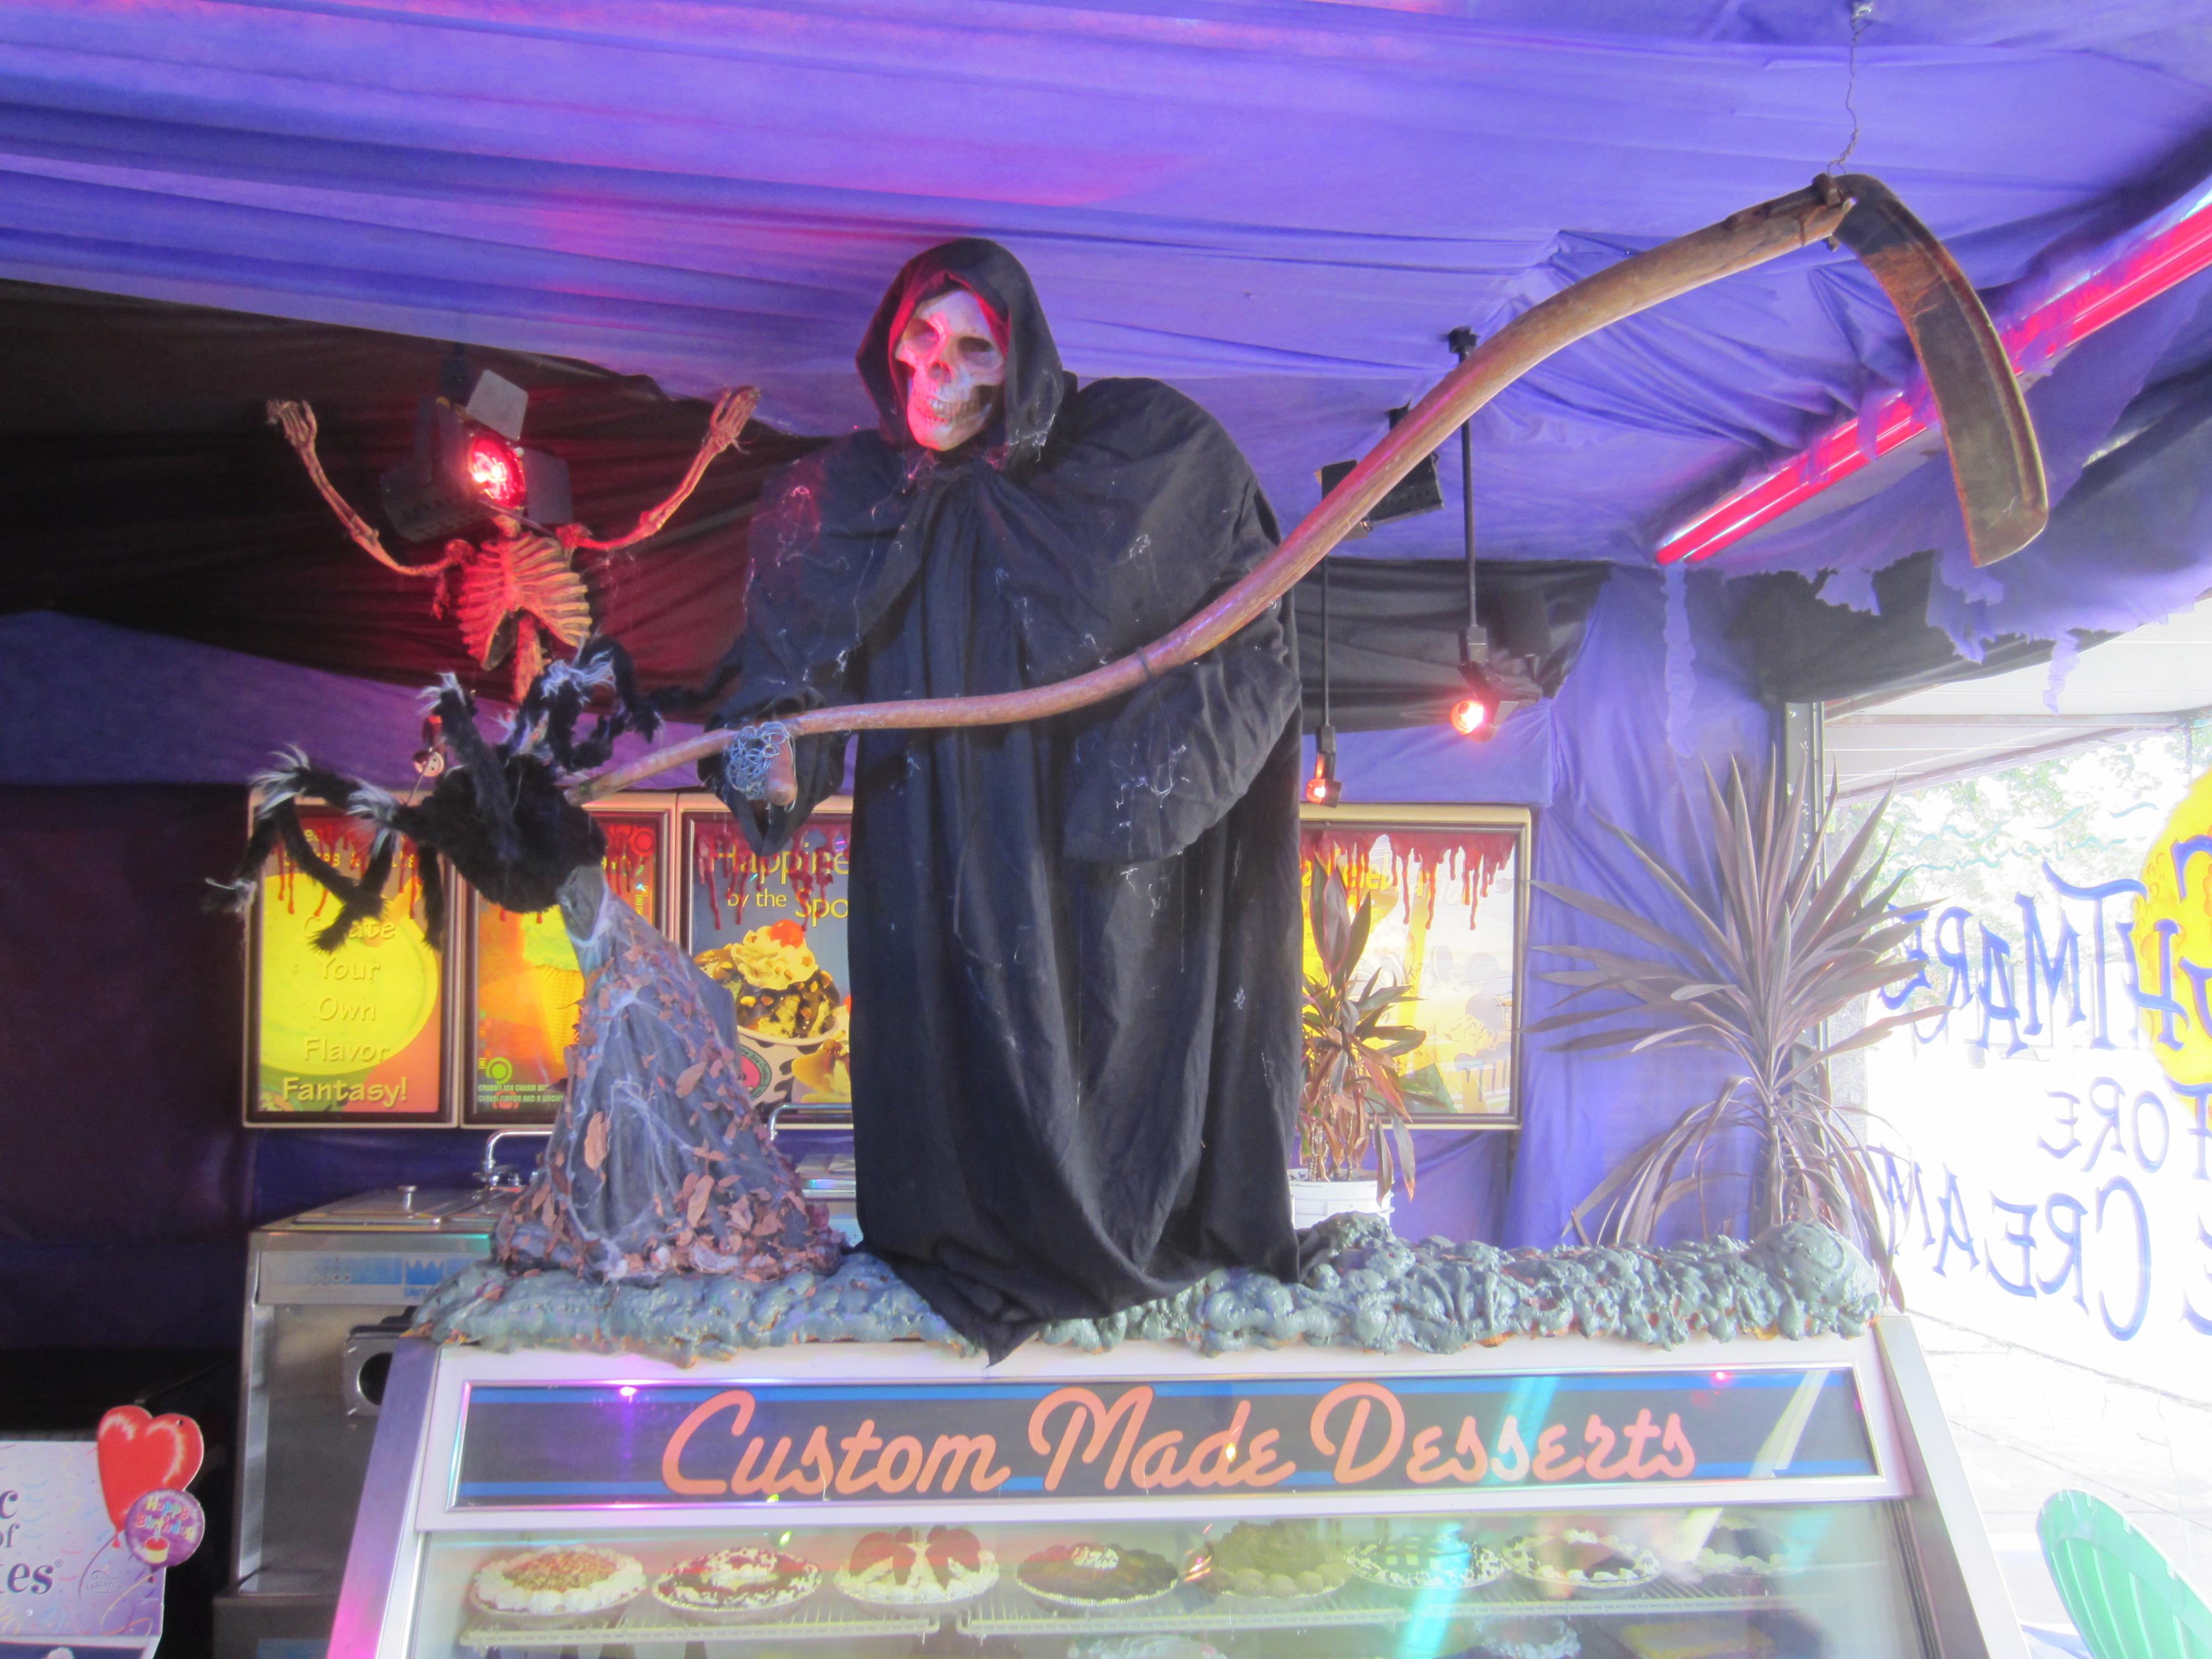 A Shop That Spooks Customers   NFIB   NFIB